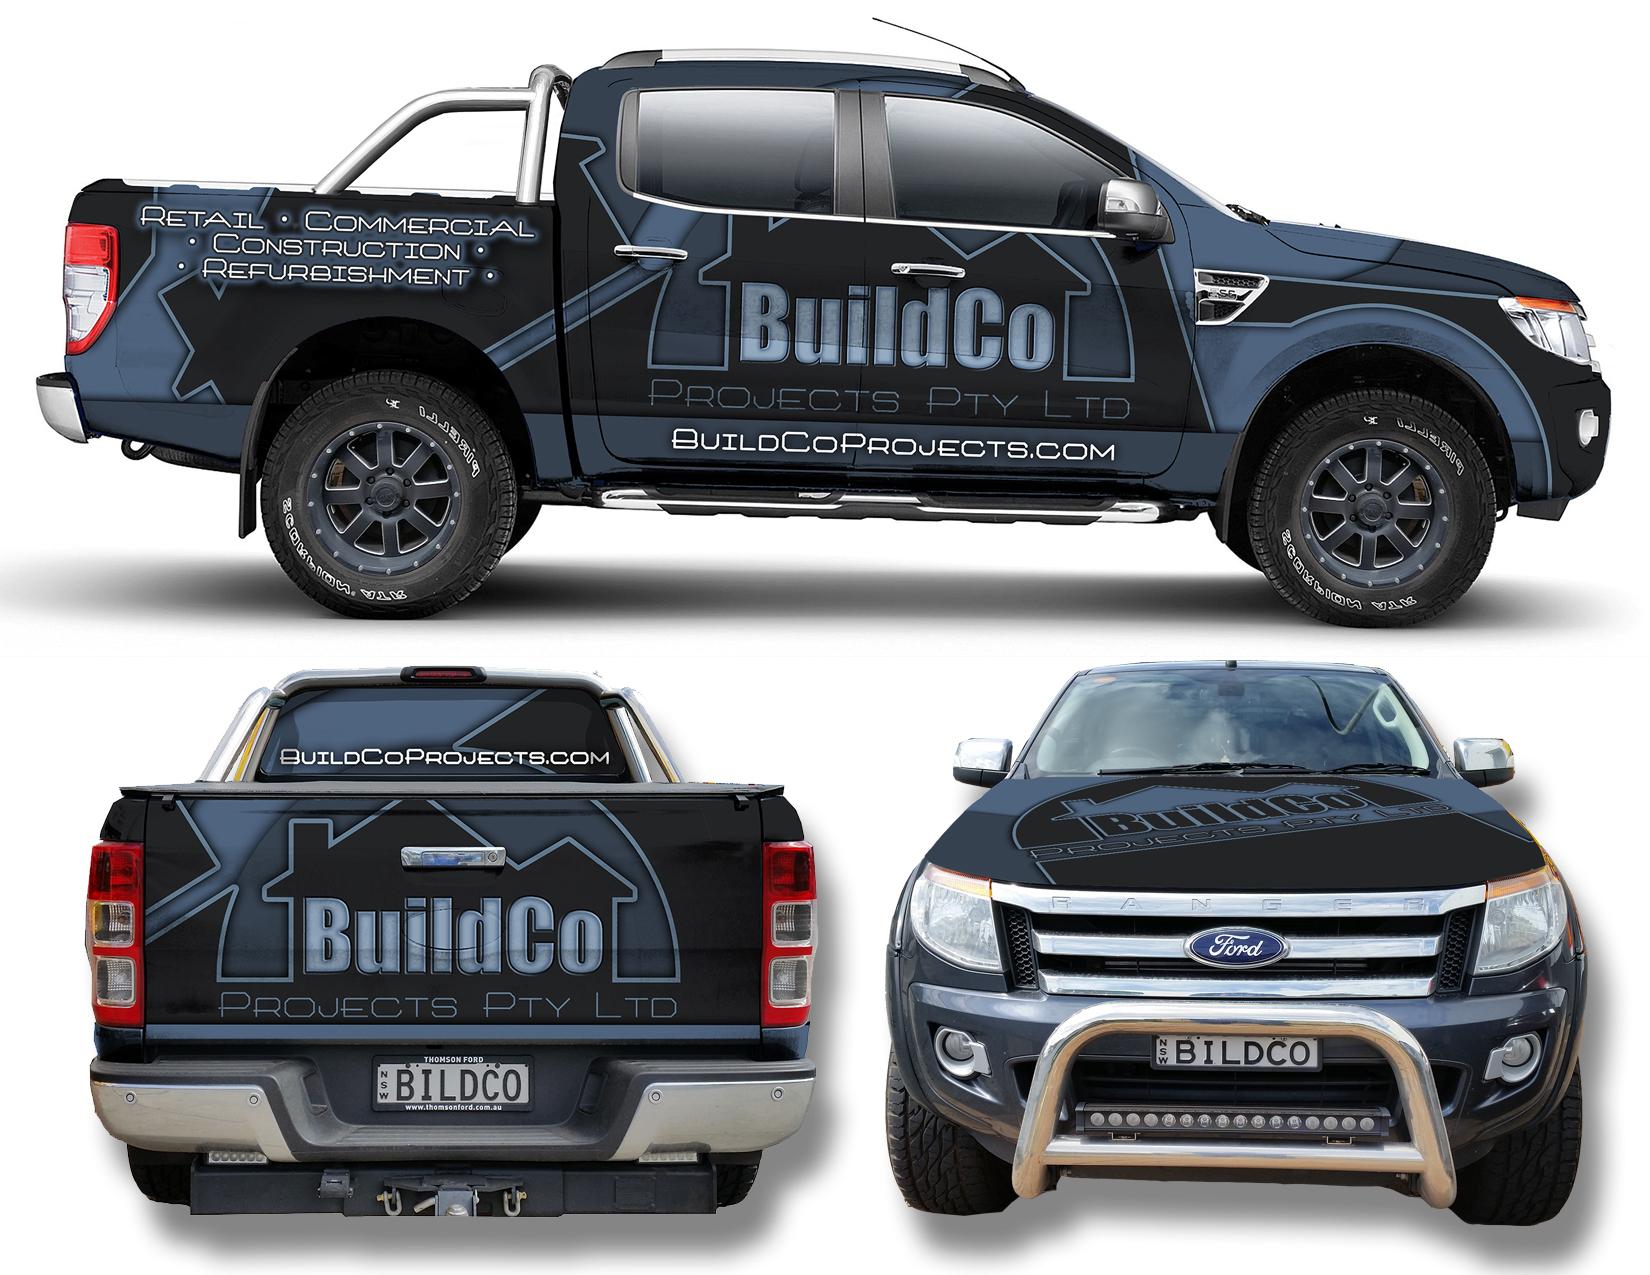 Bold car wrap for construction company construction companiesvehicle wraps signagedecalbranding